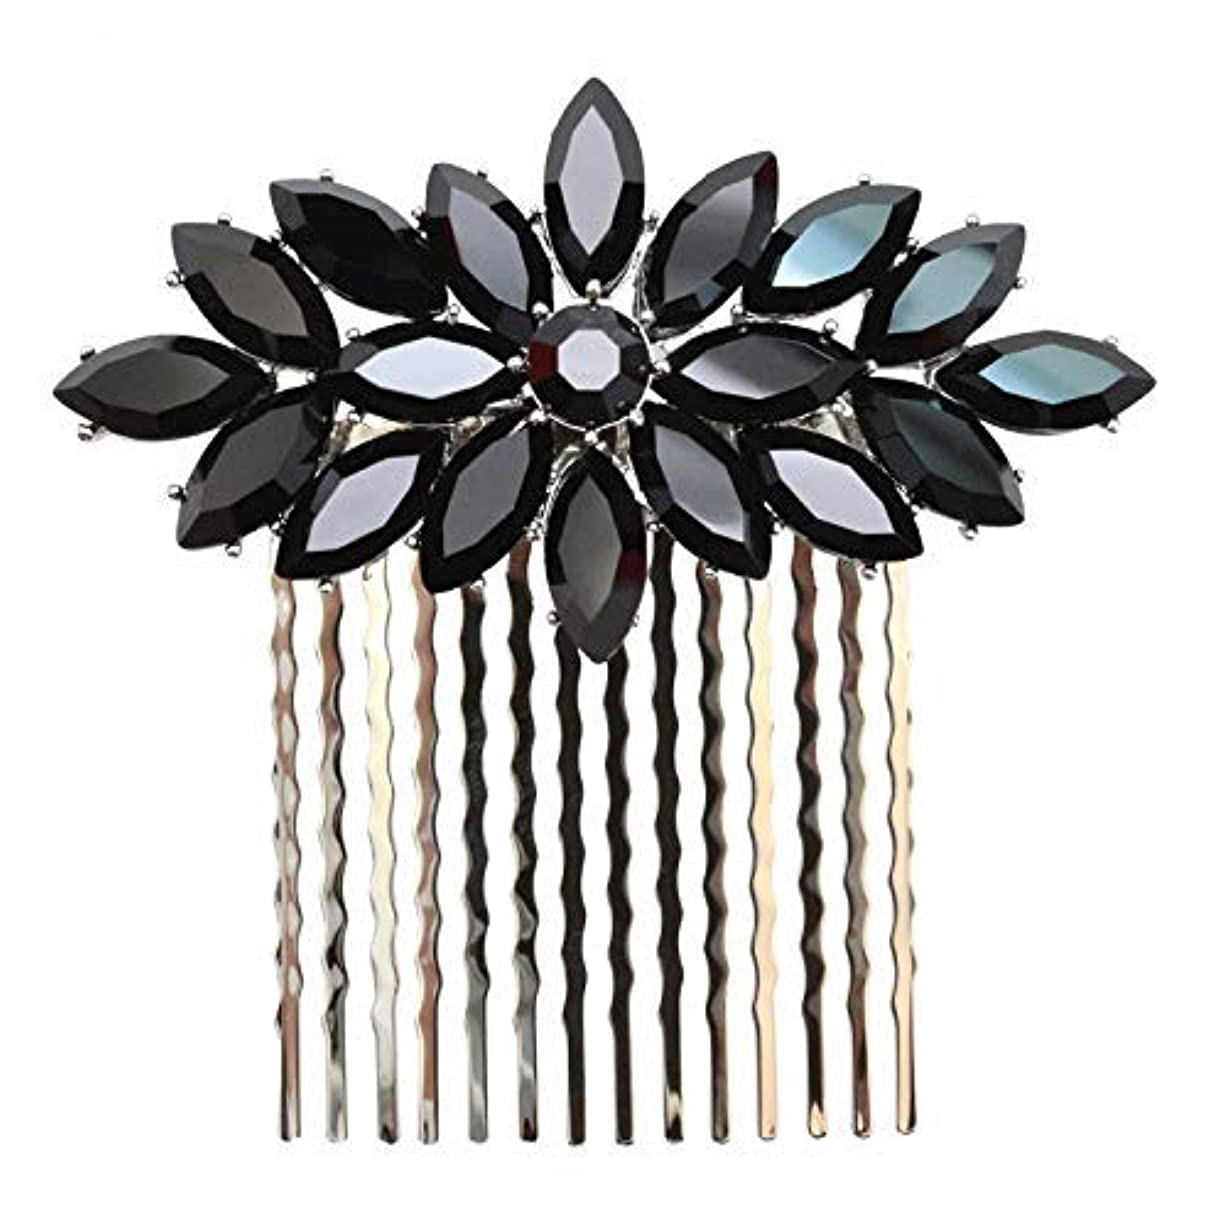 連帯推進力申請者Faship Black Rhinestone Crystal Floral Hair Comb [並行輸入品]